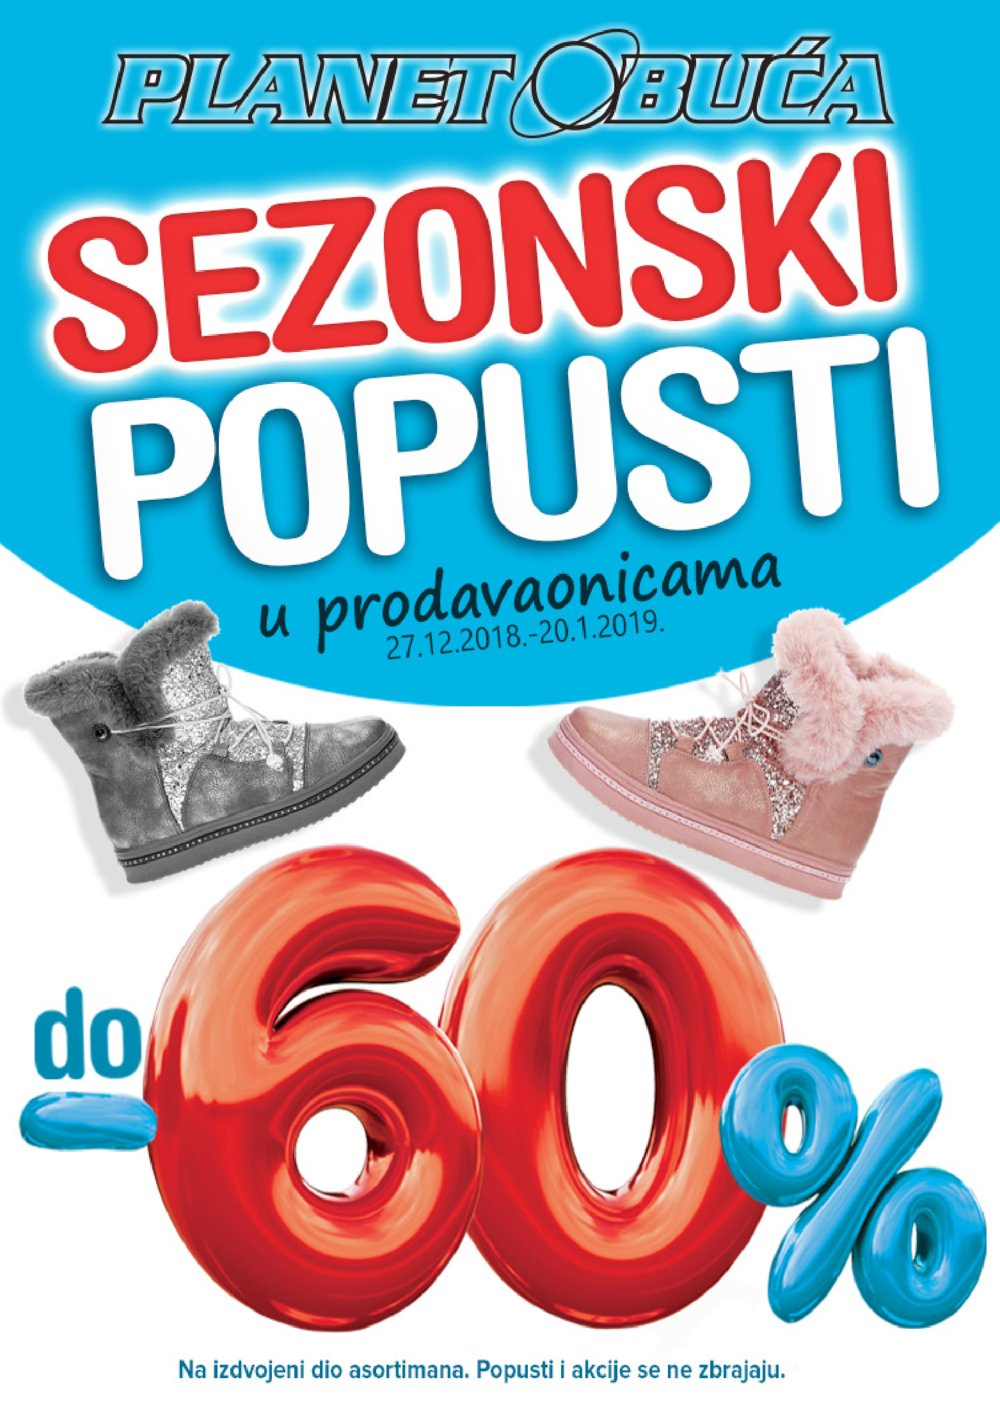 Planet Obuće letak Sezonski popusti 27.12.-20.1.2019.